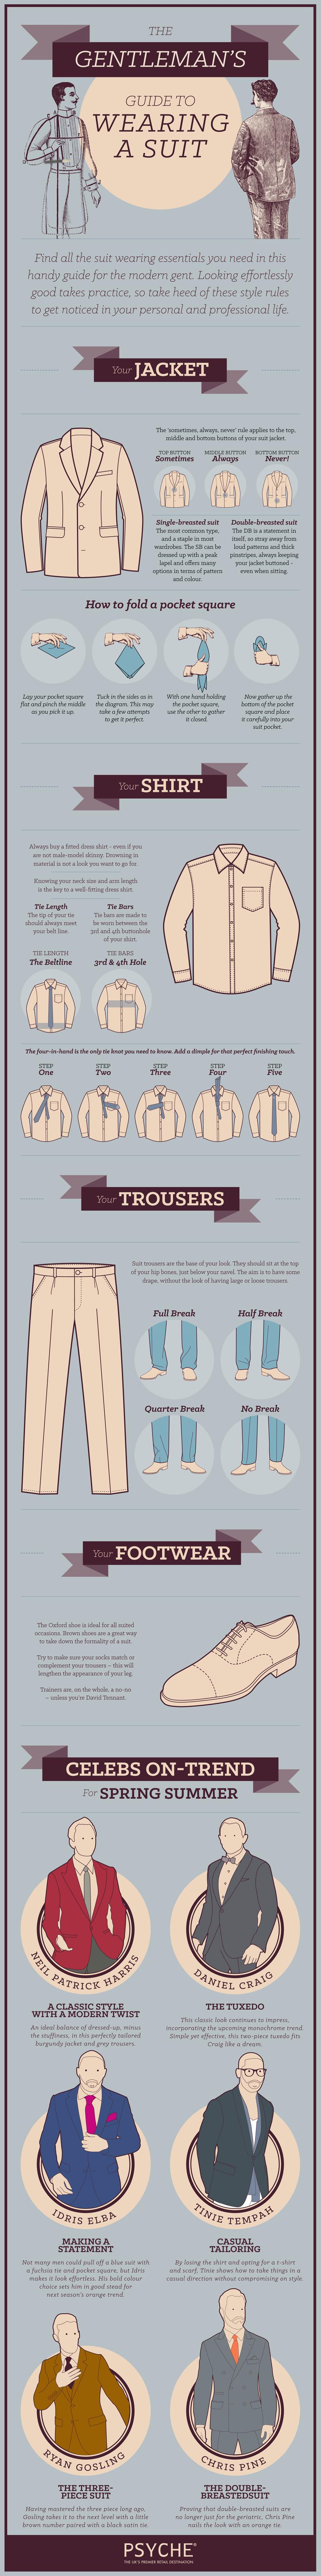 hur-sitter-en-bra-kostym-allt-du-behover-veta-om-din-kostym